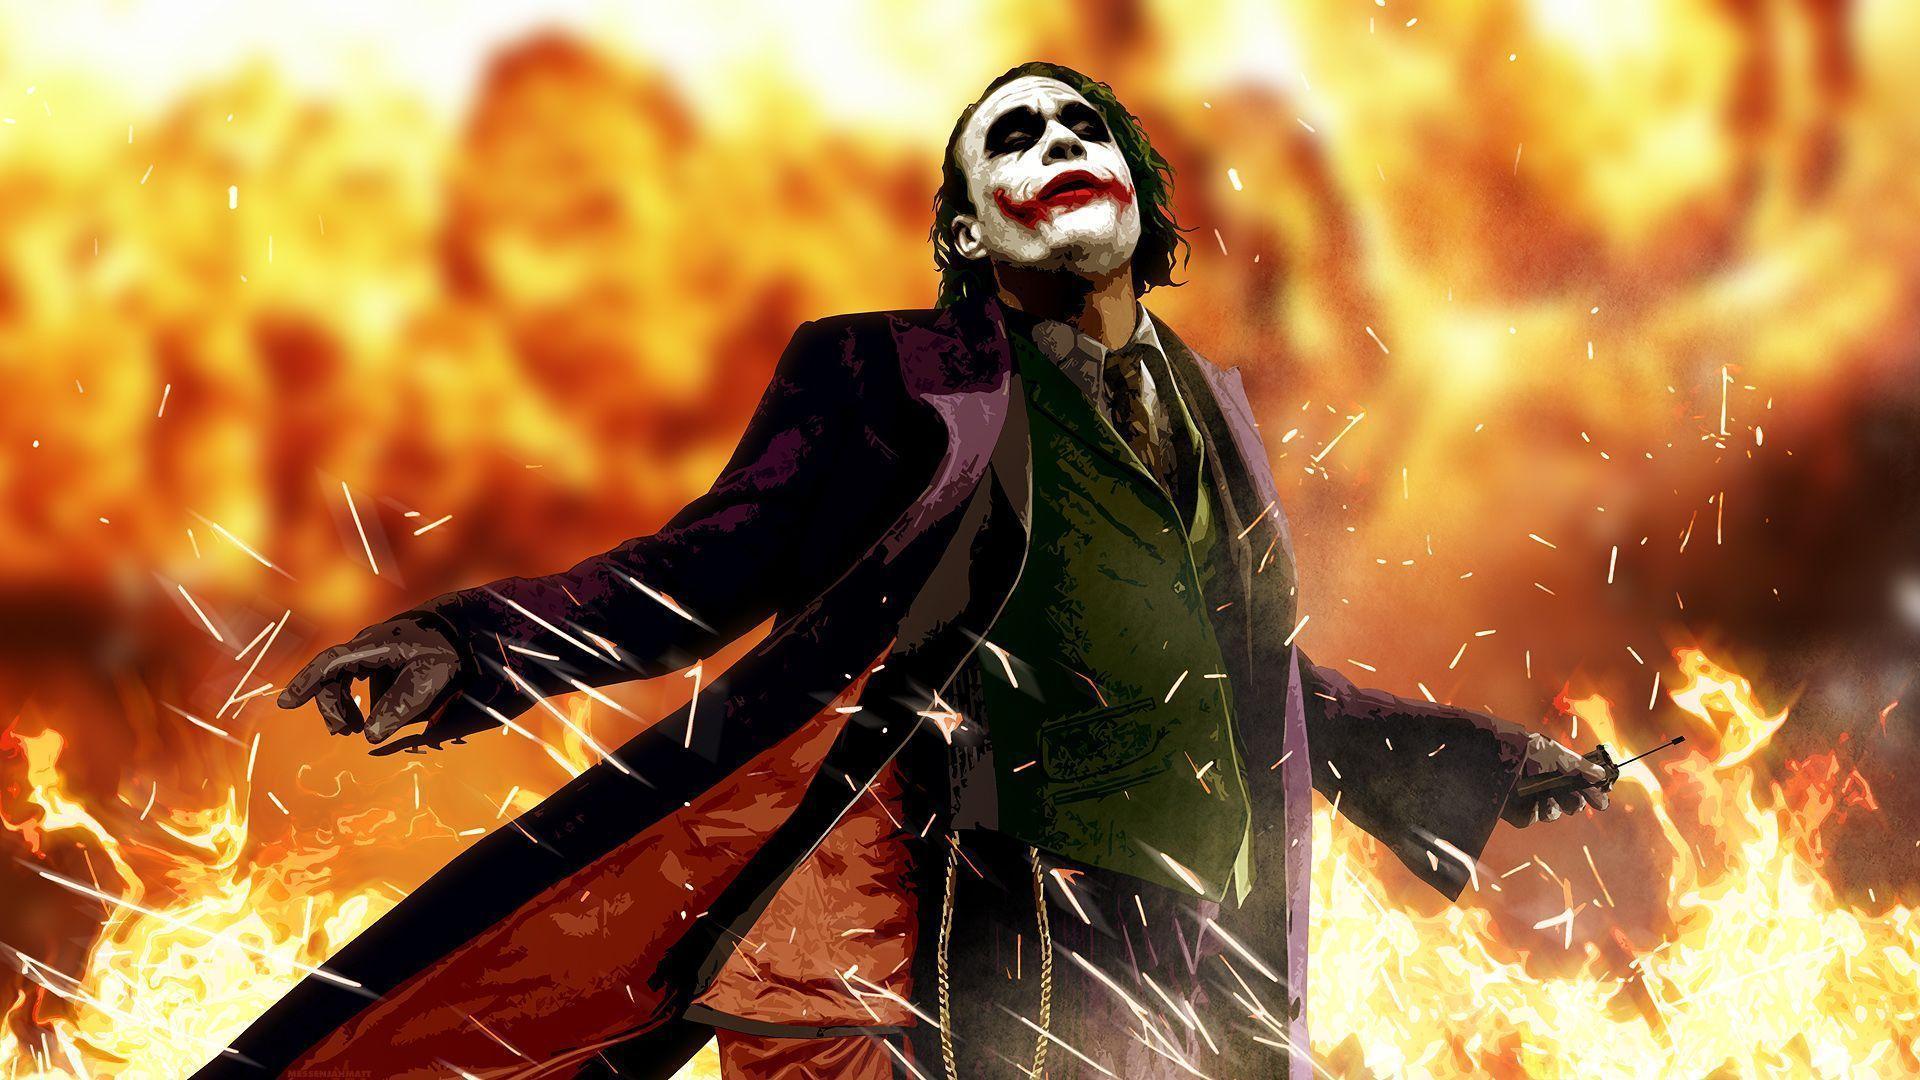 Joker Wallpapers Wallpaper Cave